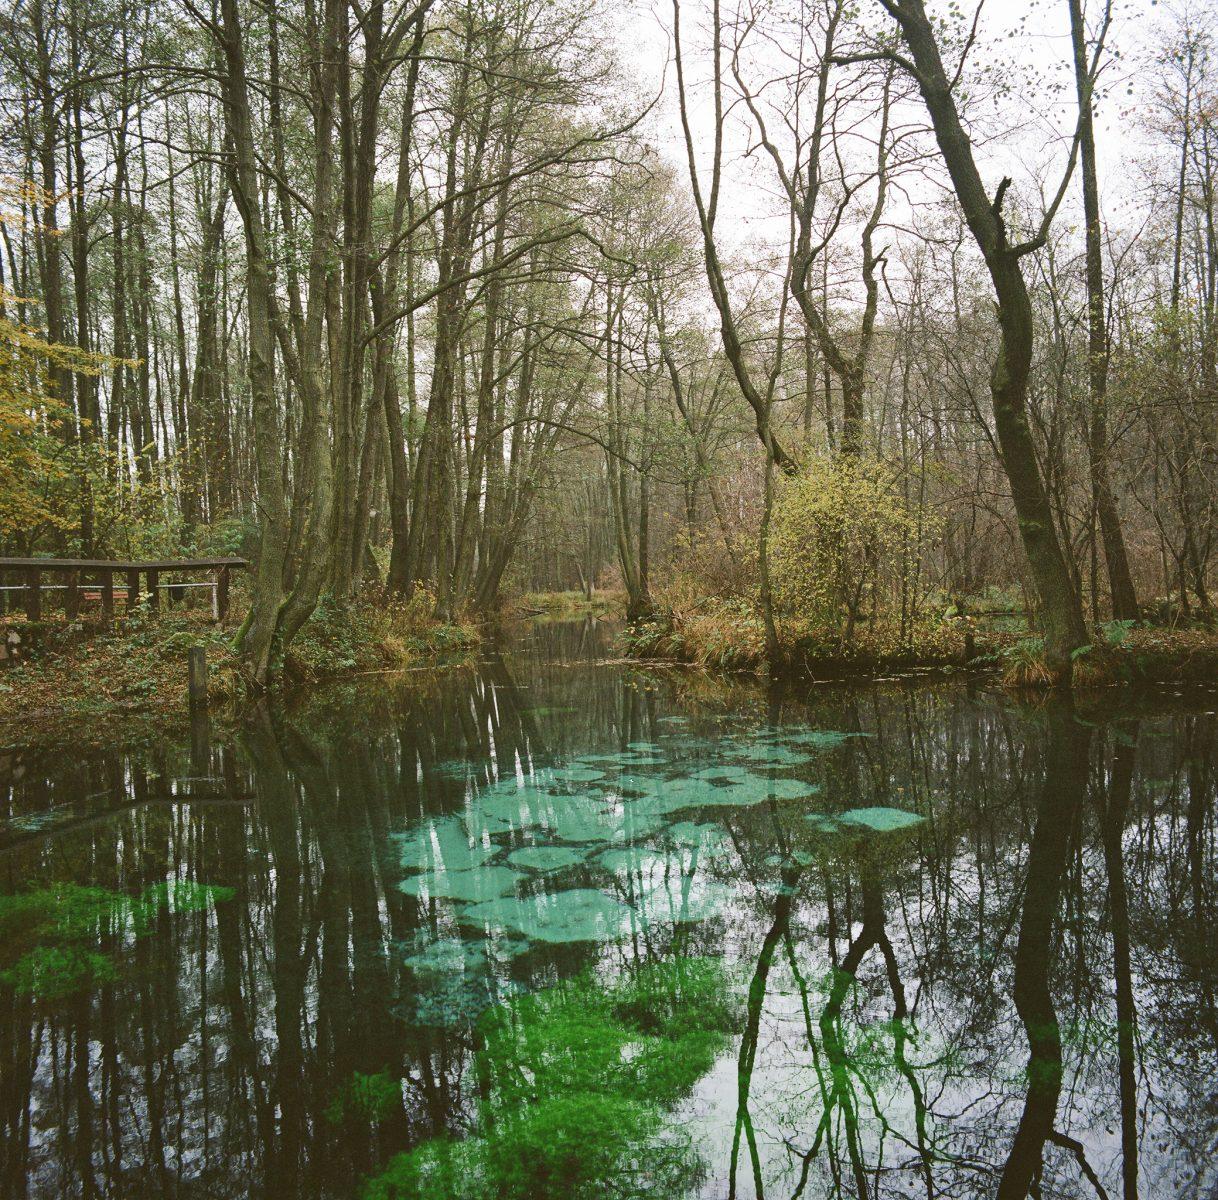 Karst springs with intensely turquoise water around the bubbling springs. Blue Springs Park near Tomaszów Mazowiecki. Photo Simone De Iacobis, 2020